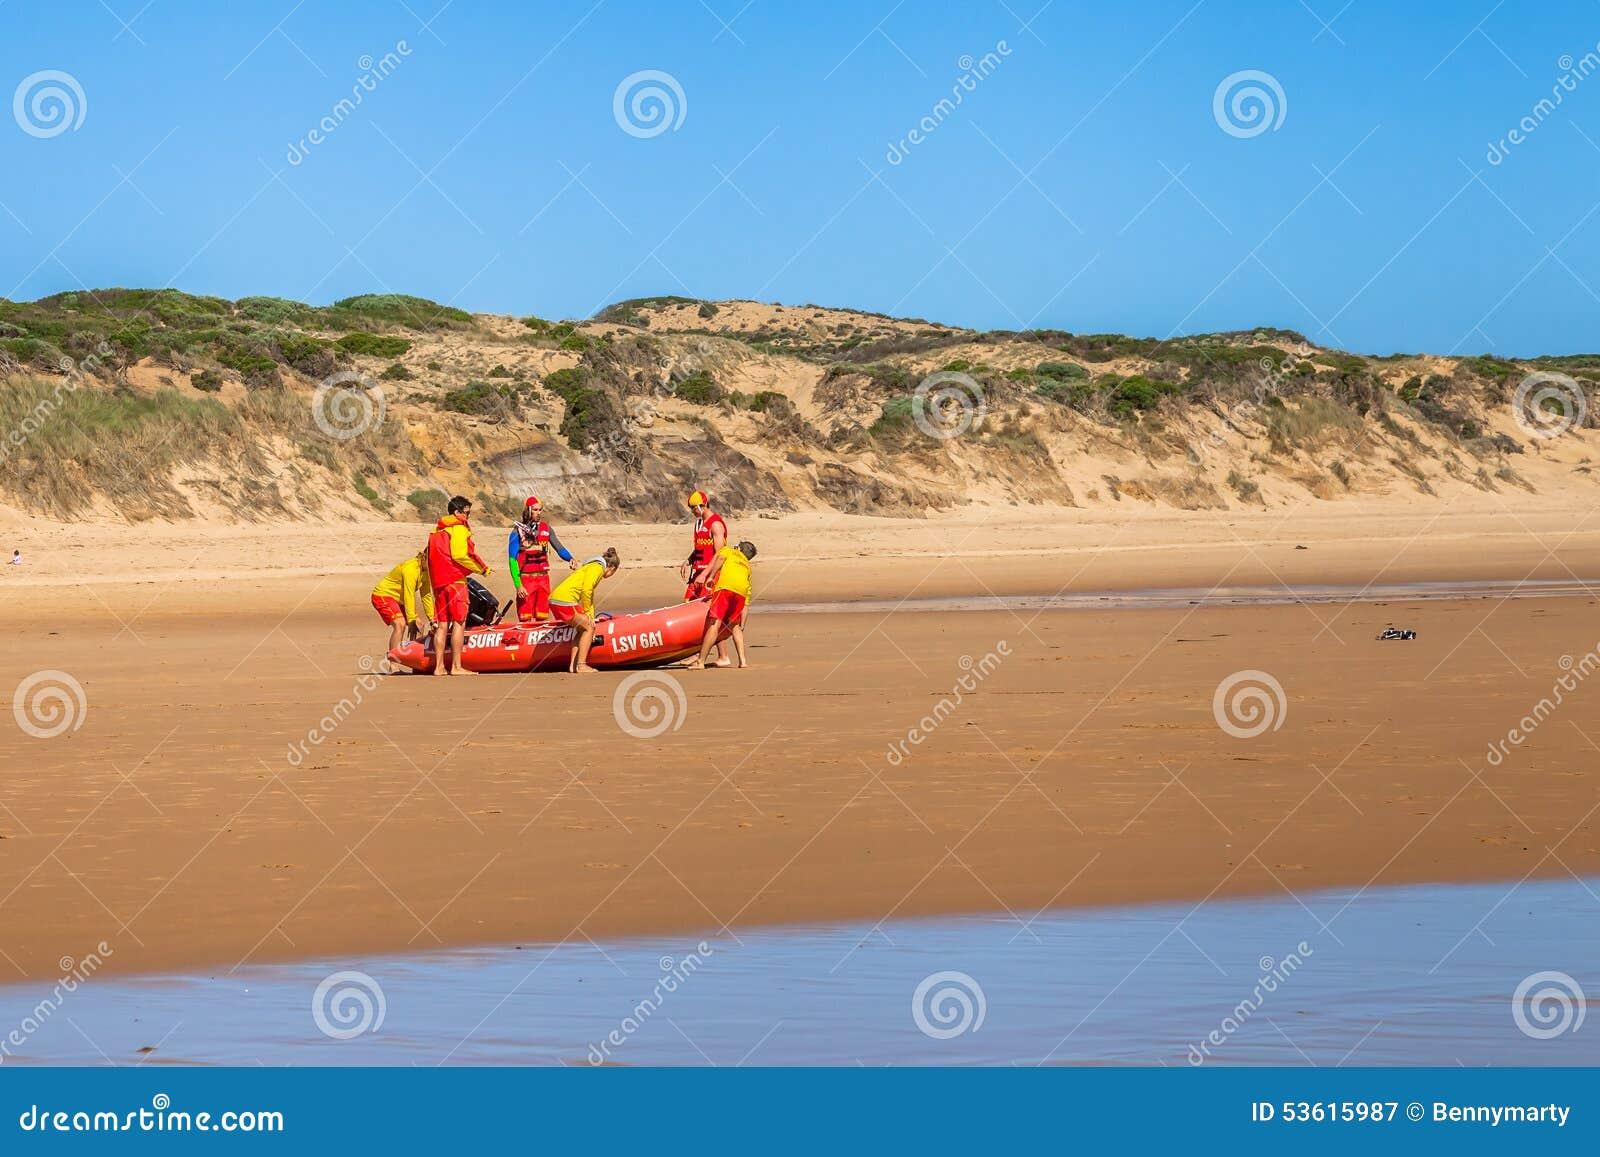 Phillip Island Surf Club